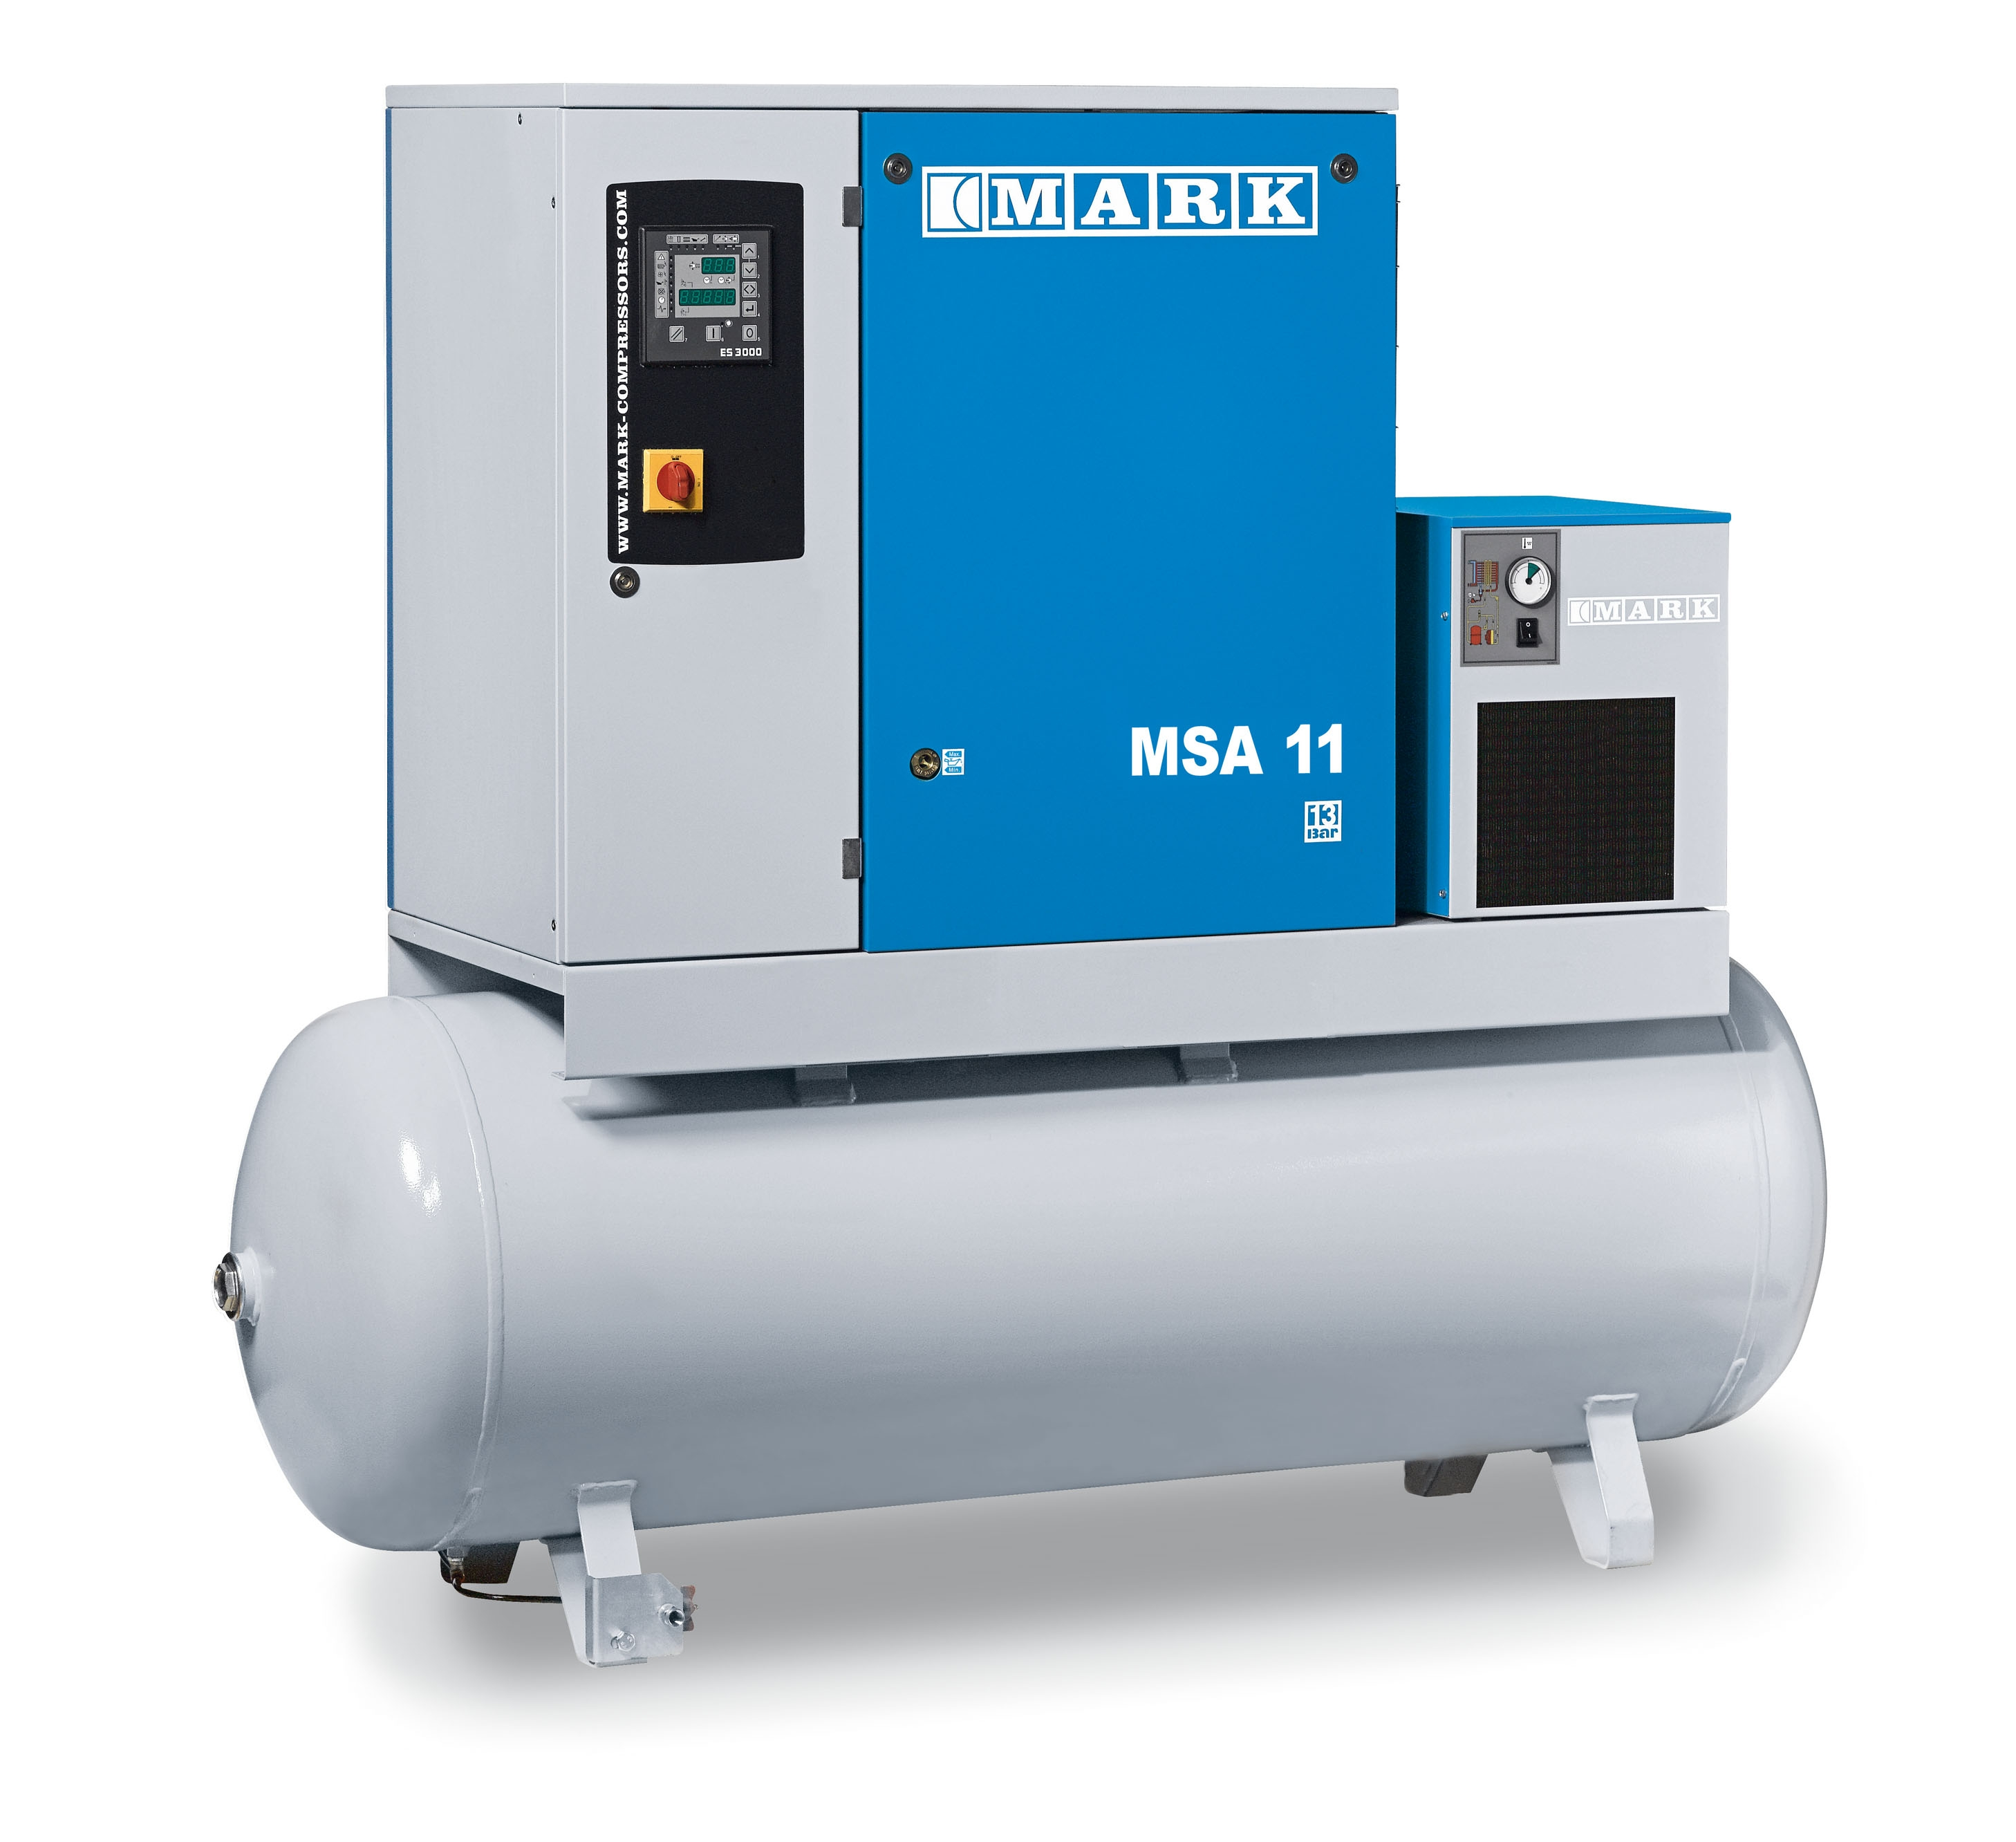 MSA 11 tank + dryer